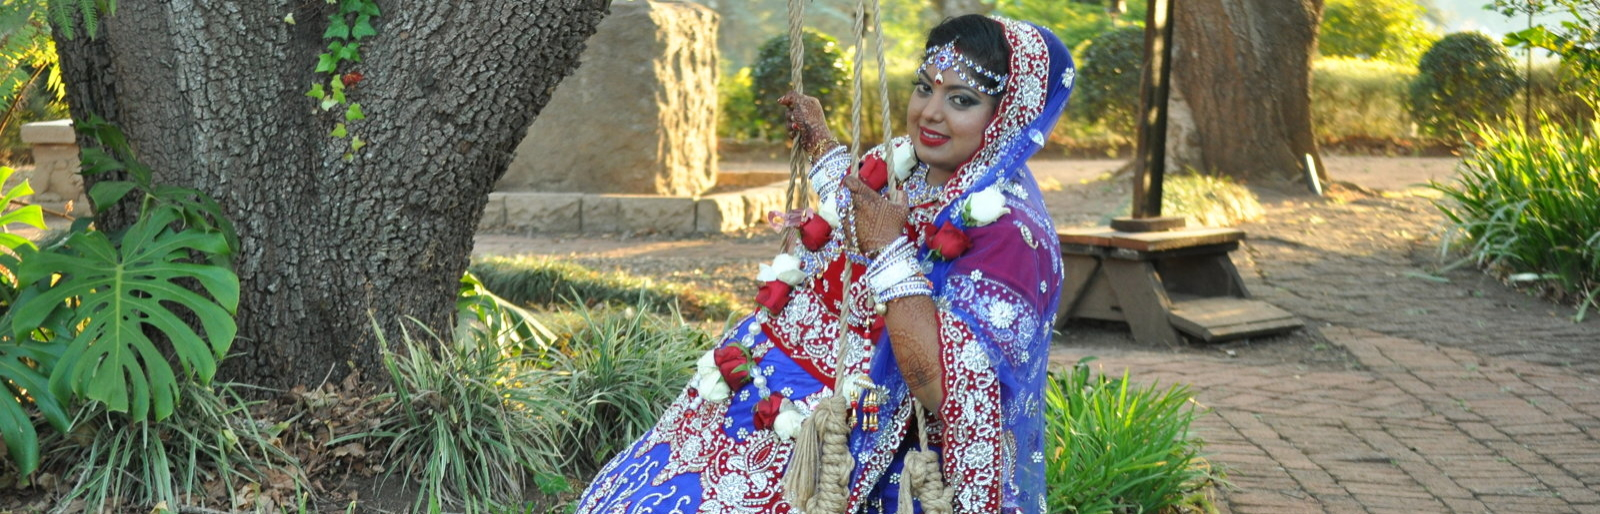 Ashona Balgobind Singh